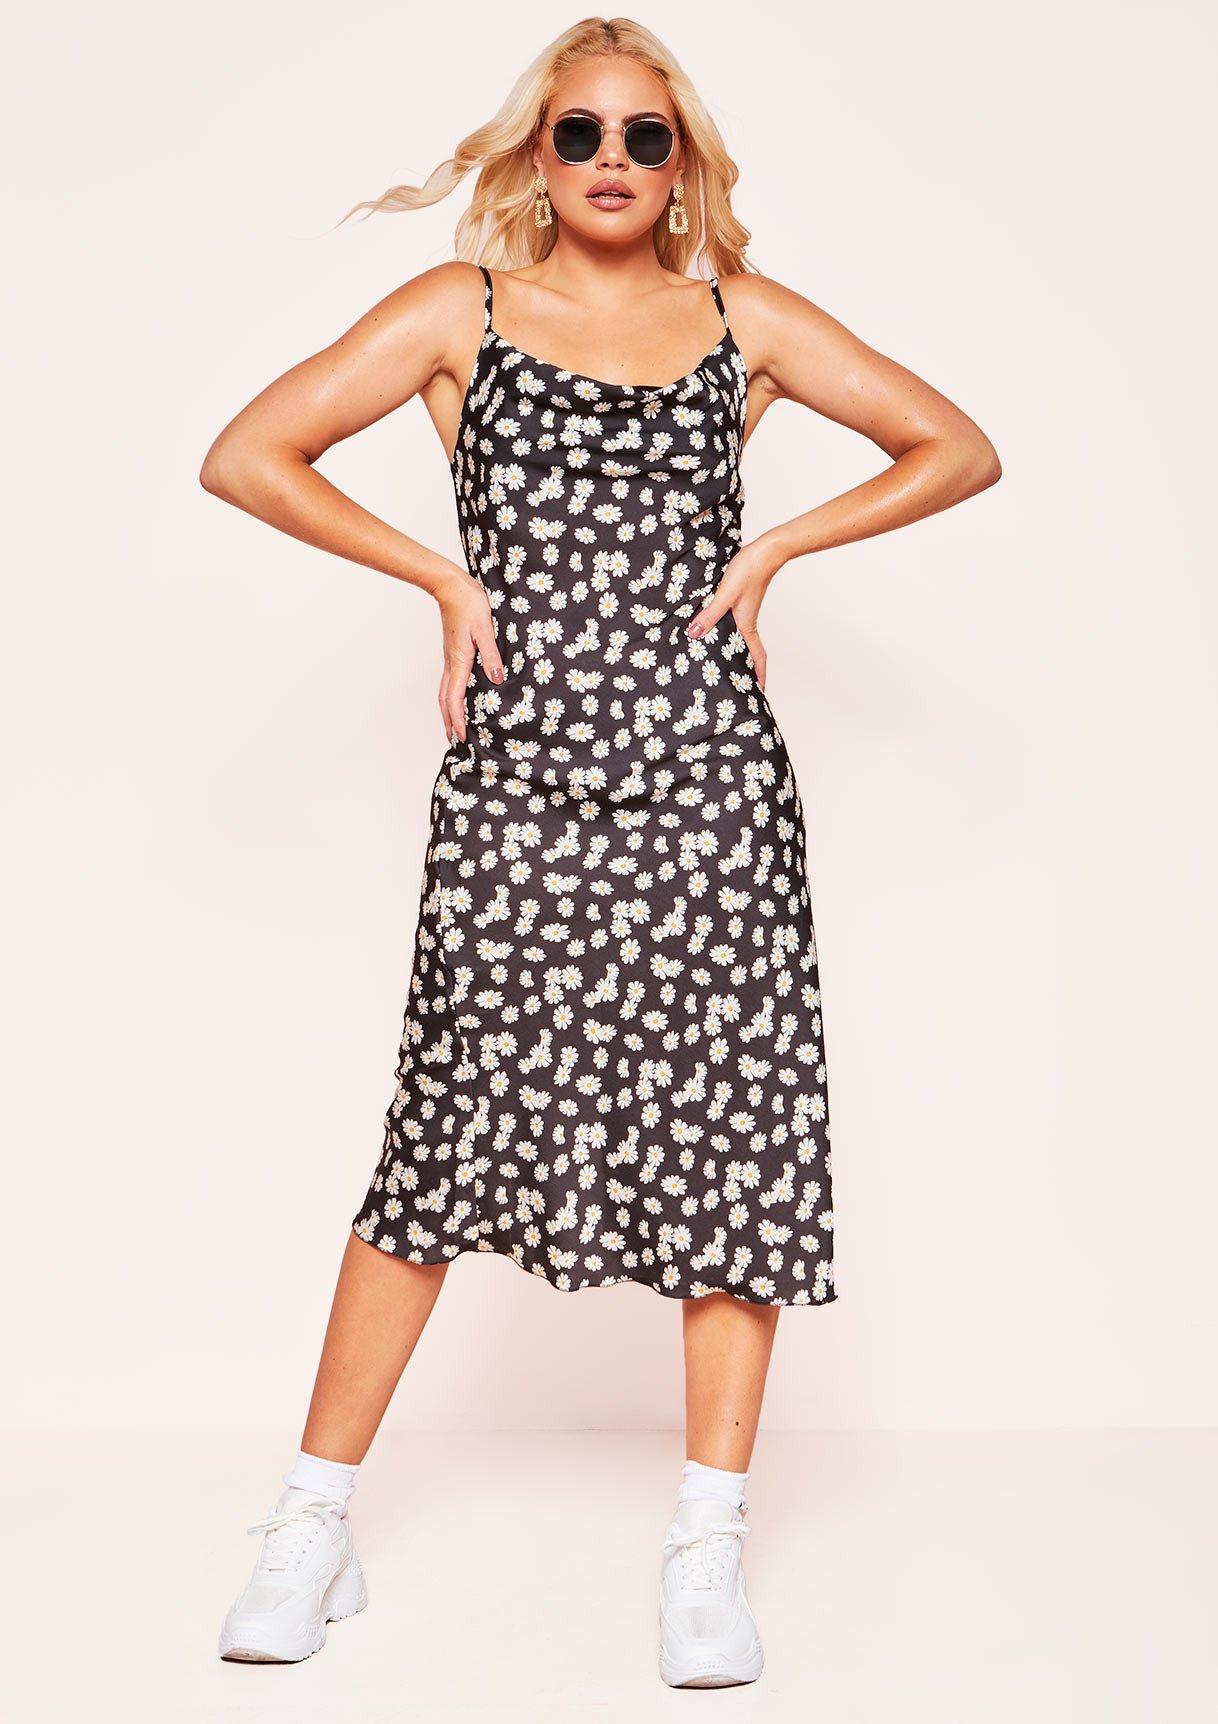 Saphire Black Floral Print Cowl Slip Dress